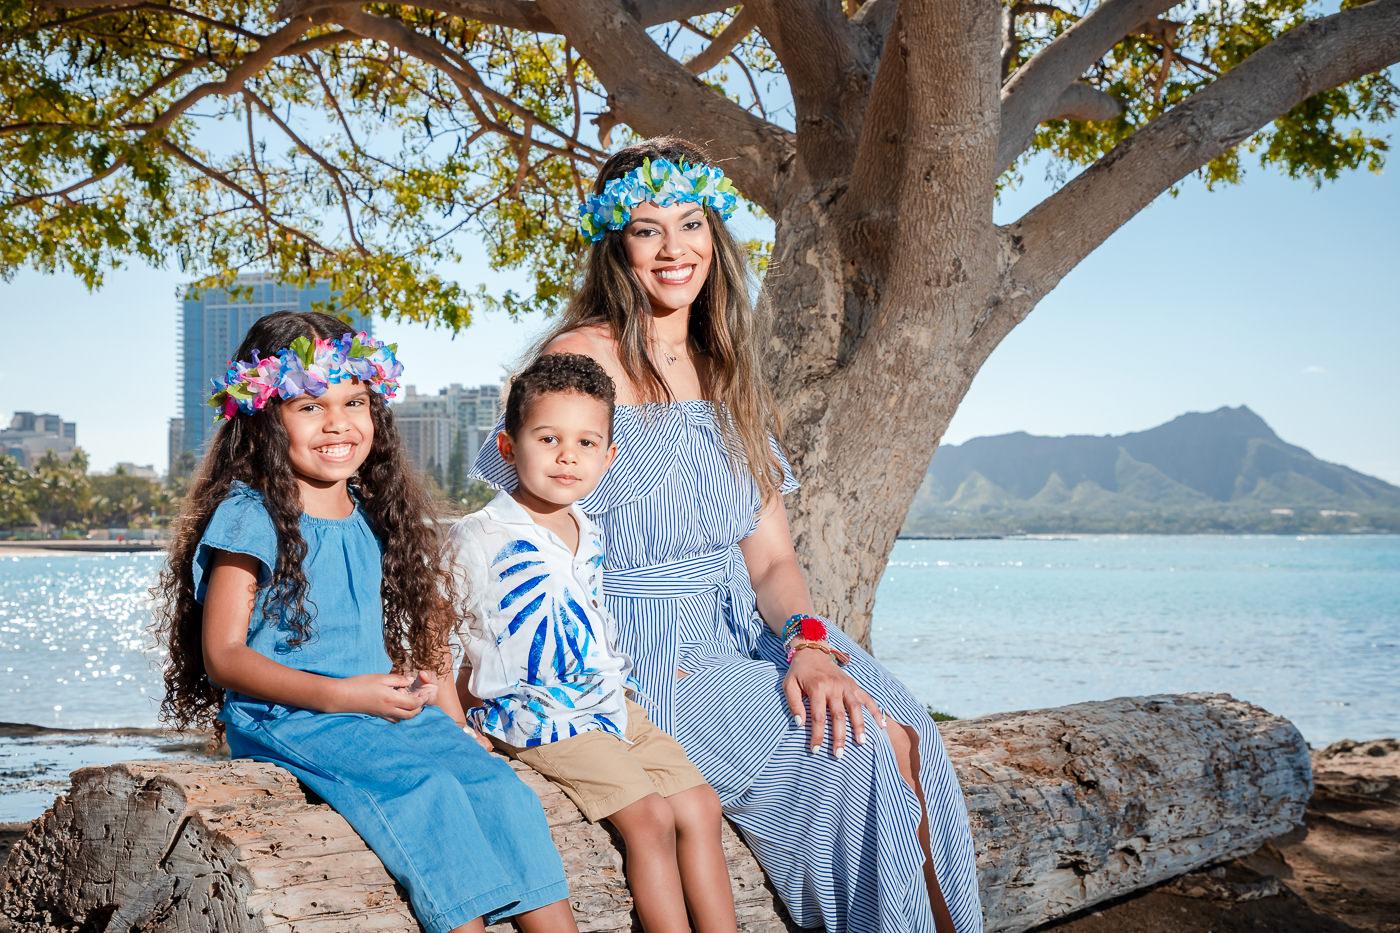 Oahu2019-3062.jpg